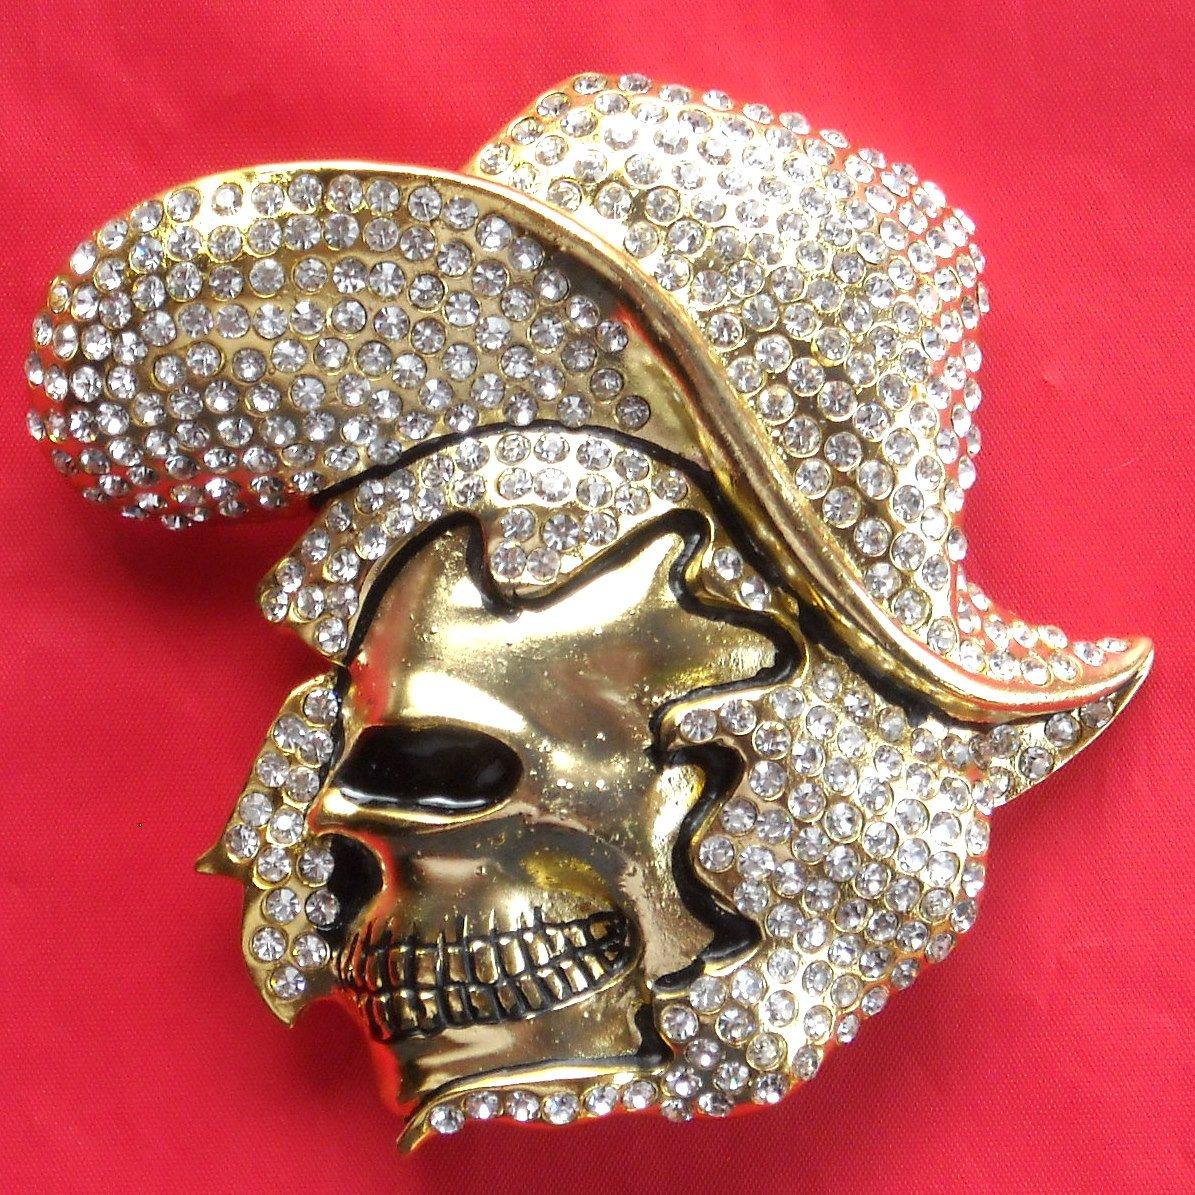 Golden Cowboy Skull with Rhinestone metal belt buckle